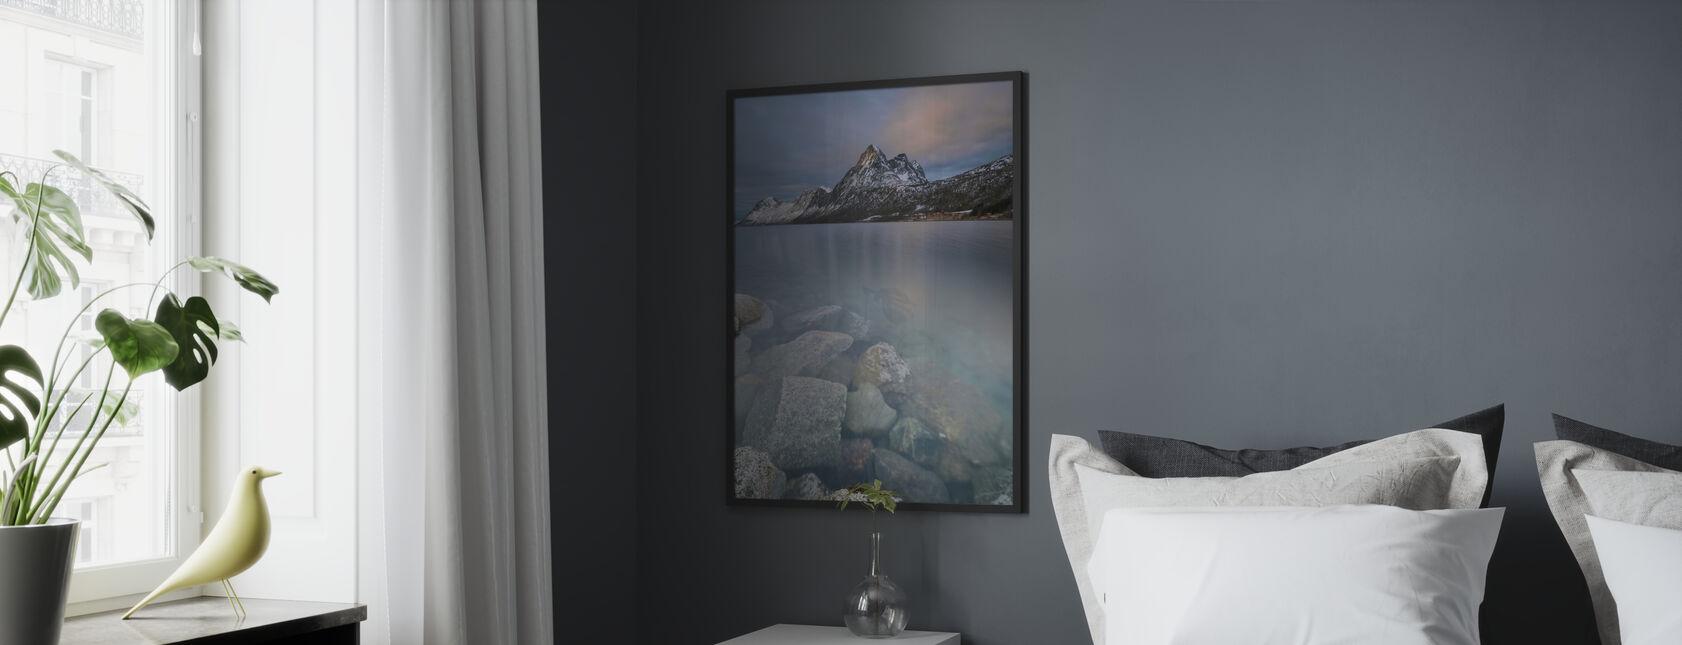 Senja-eiland - Poster - Slaapkamer